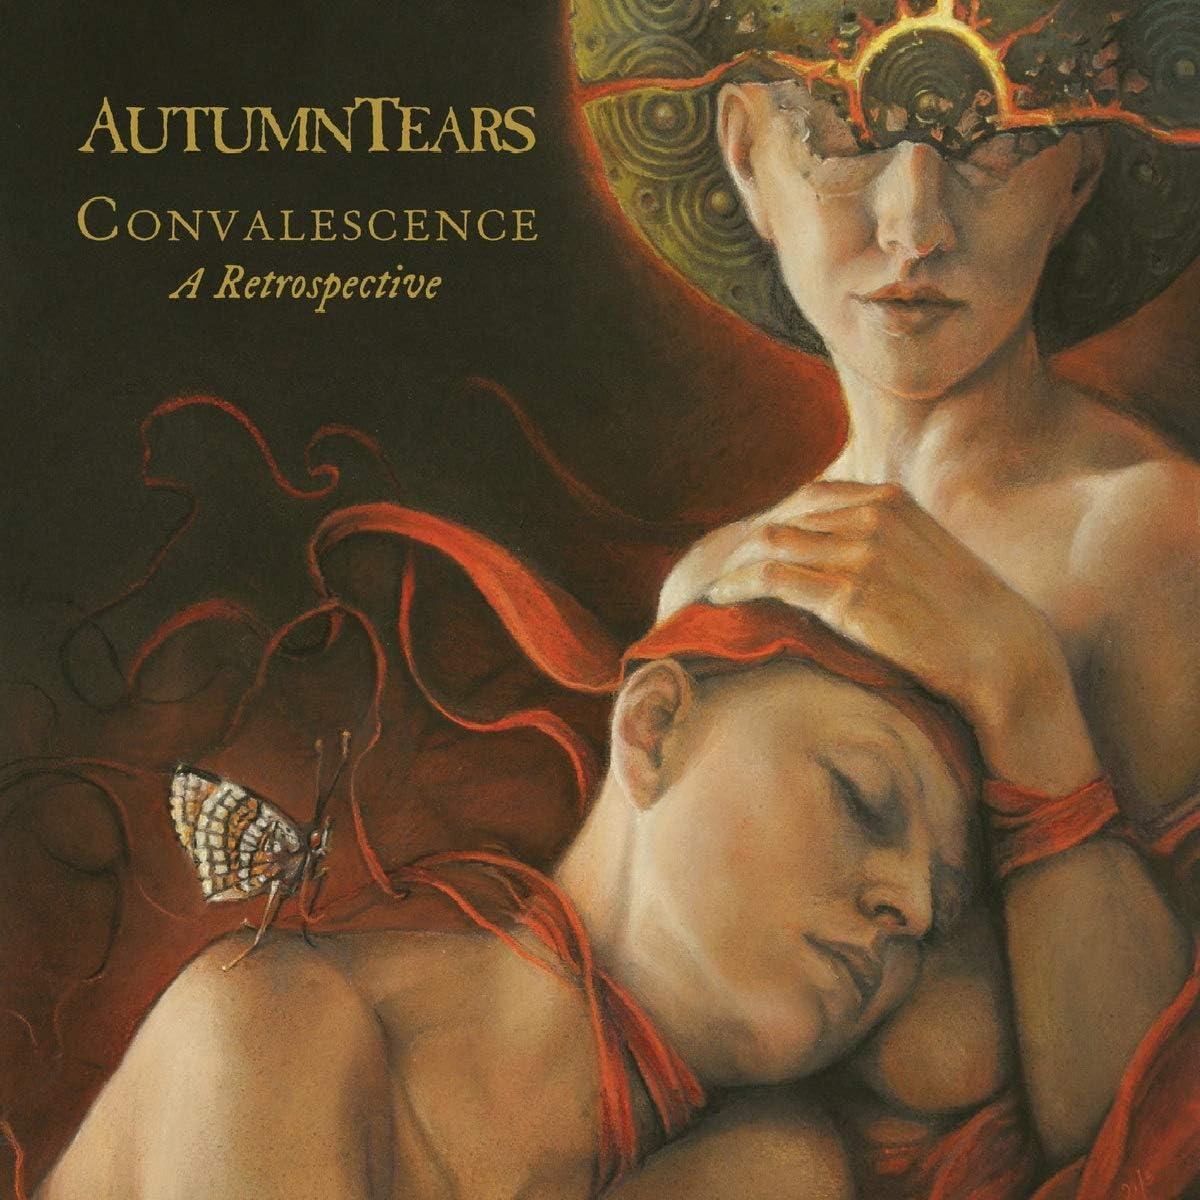 Autumn Tears image 1